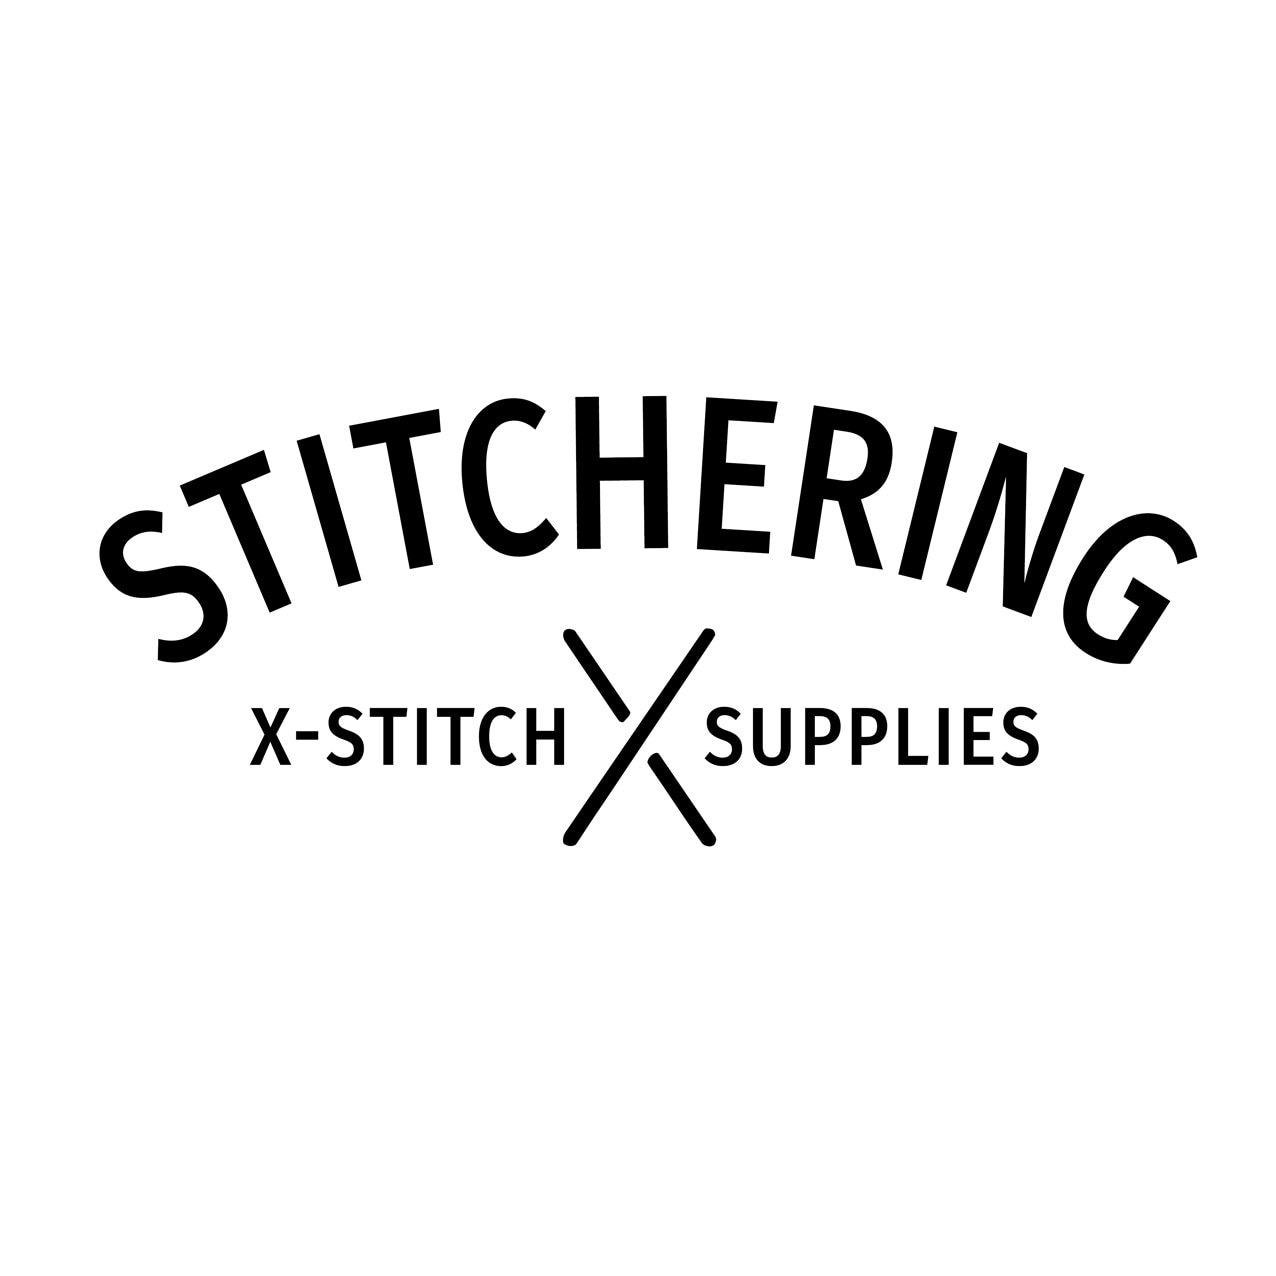 Stitchering